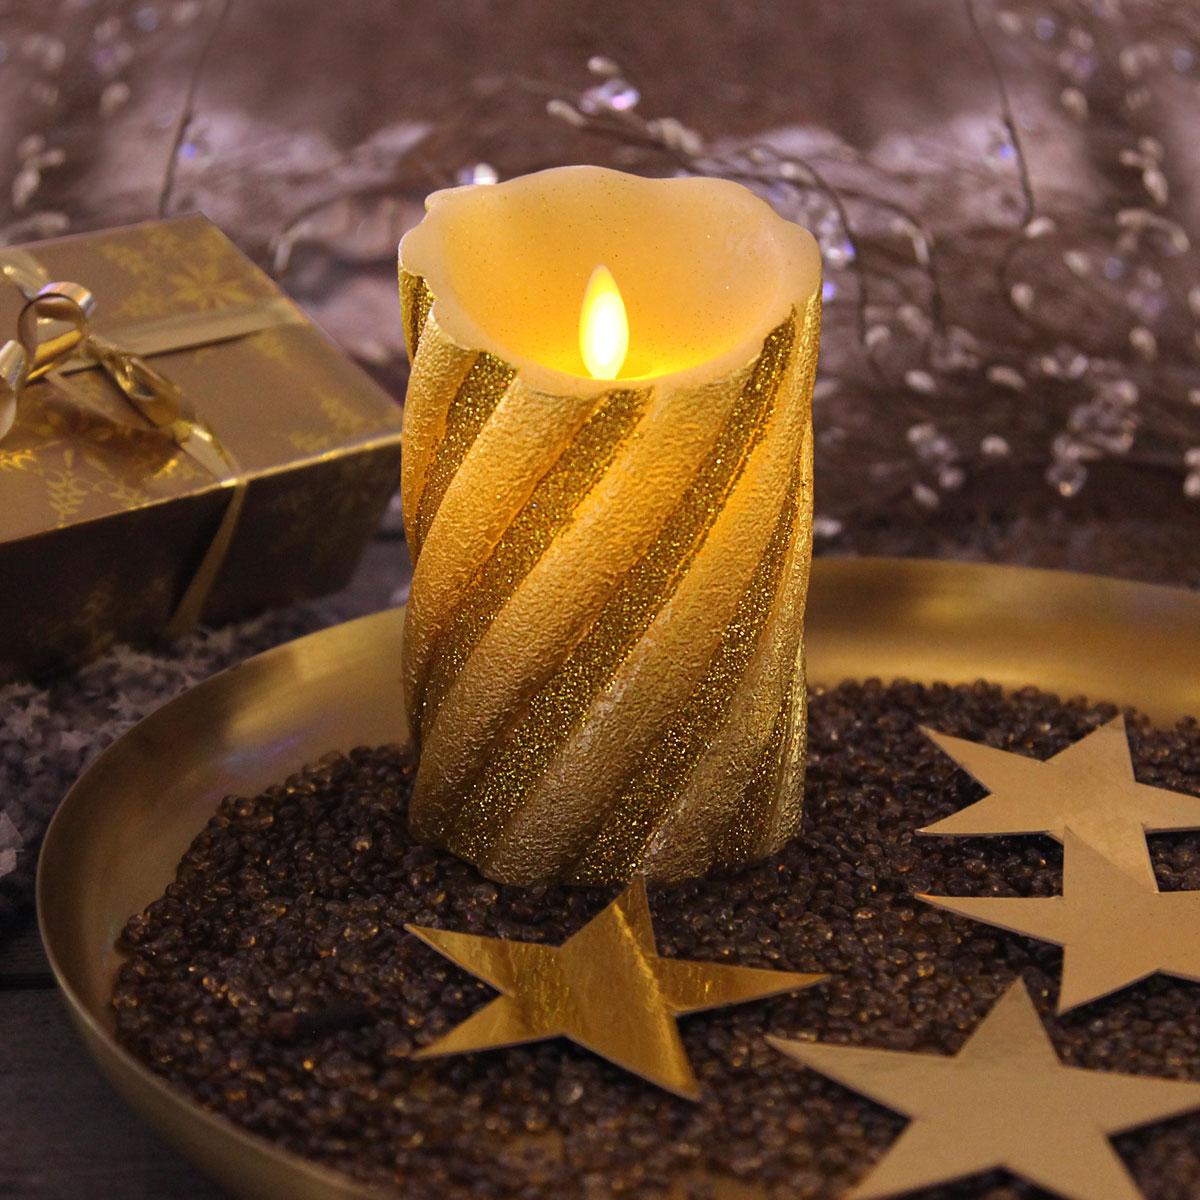 Echtwachskerze in gold mit romantischer Optik